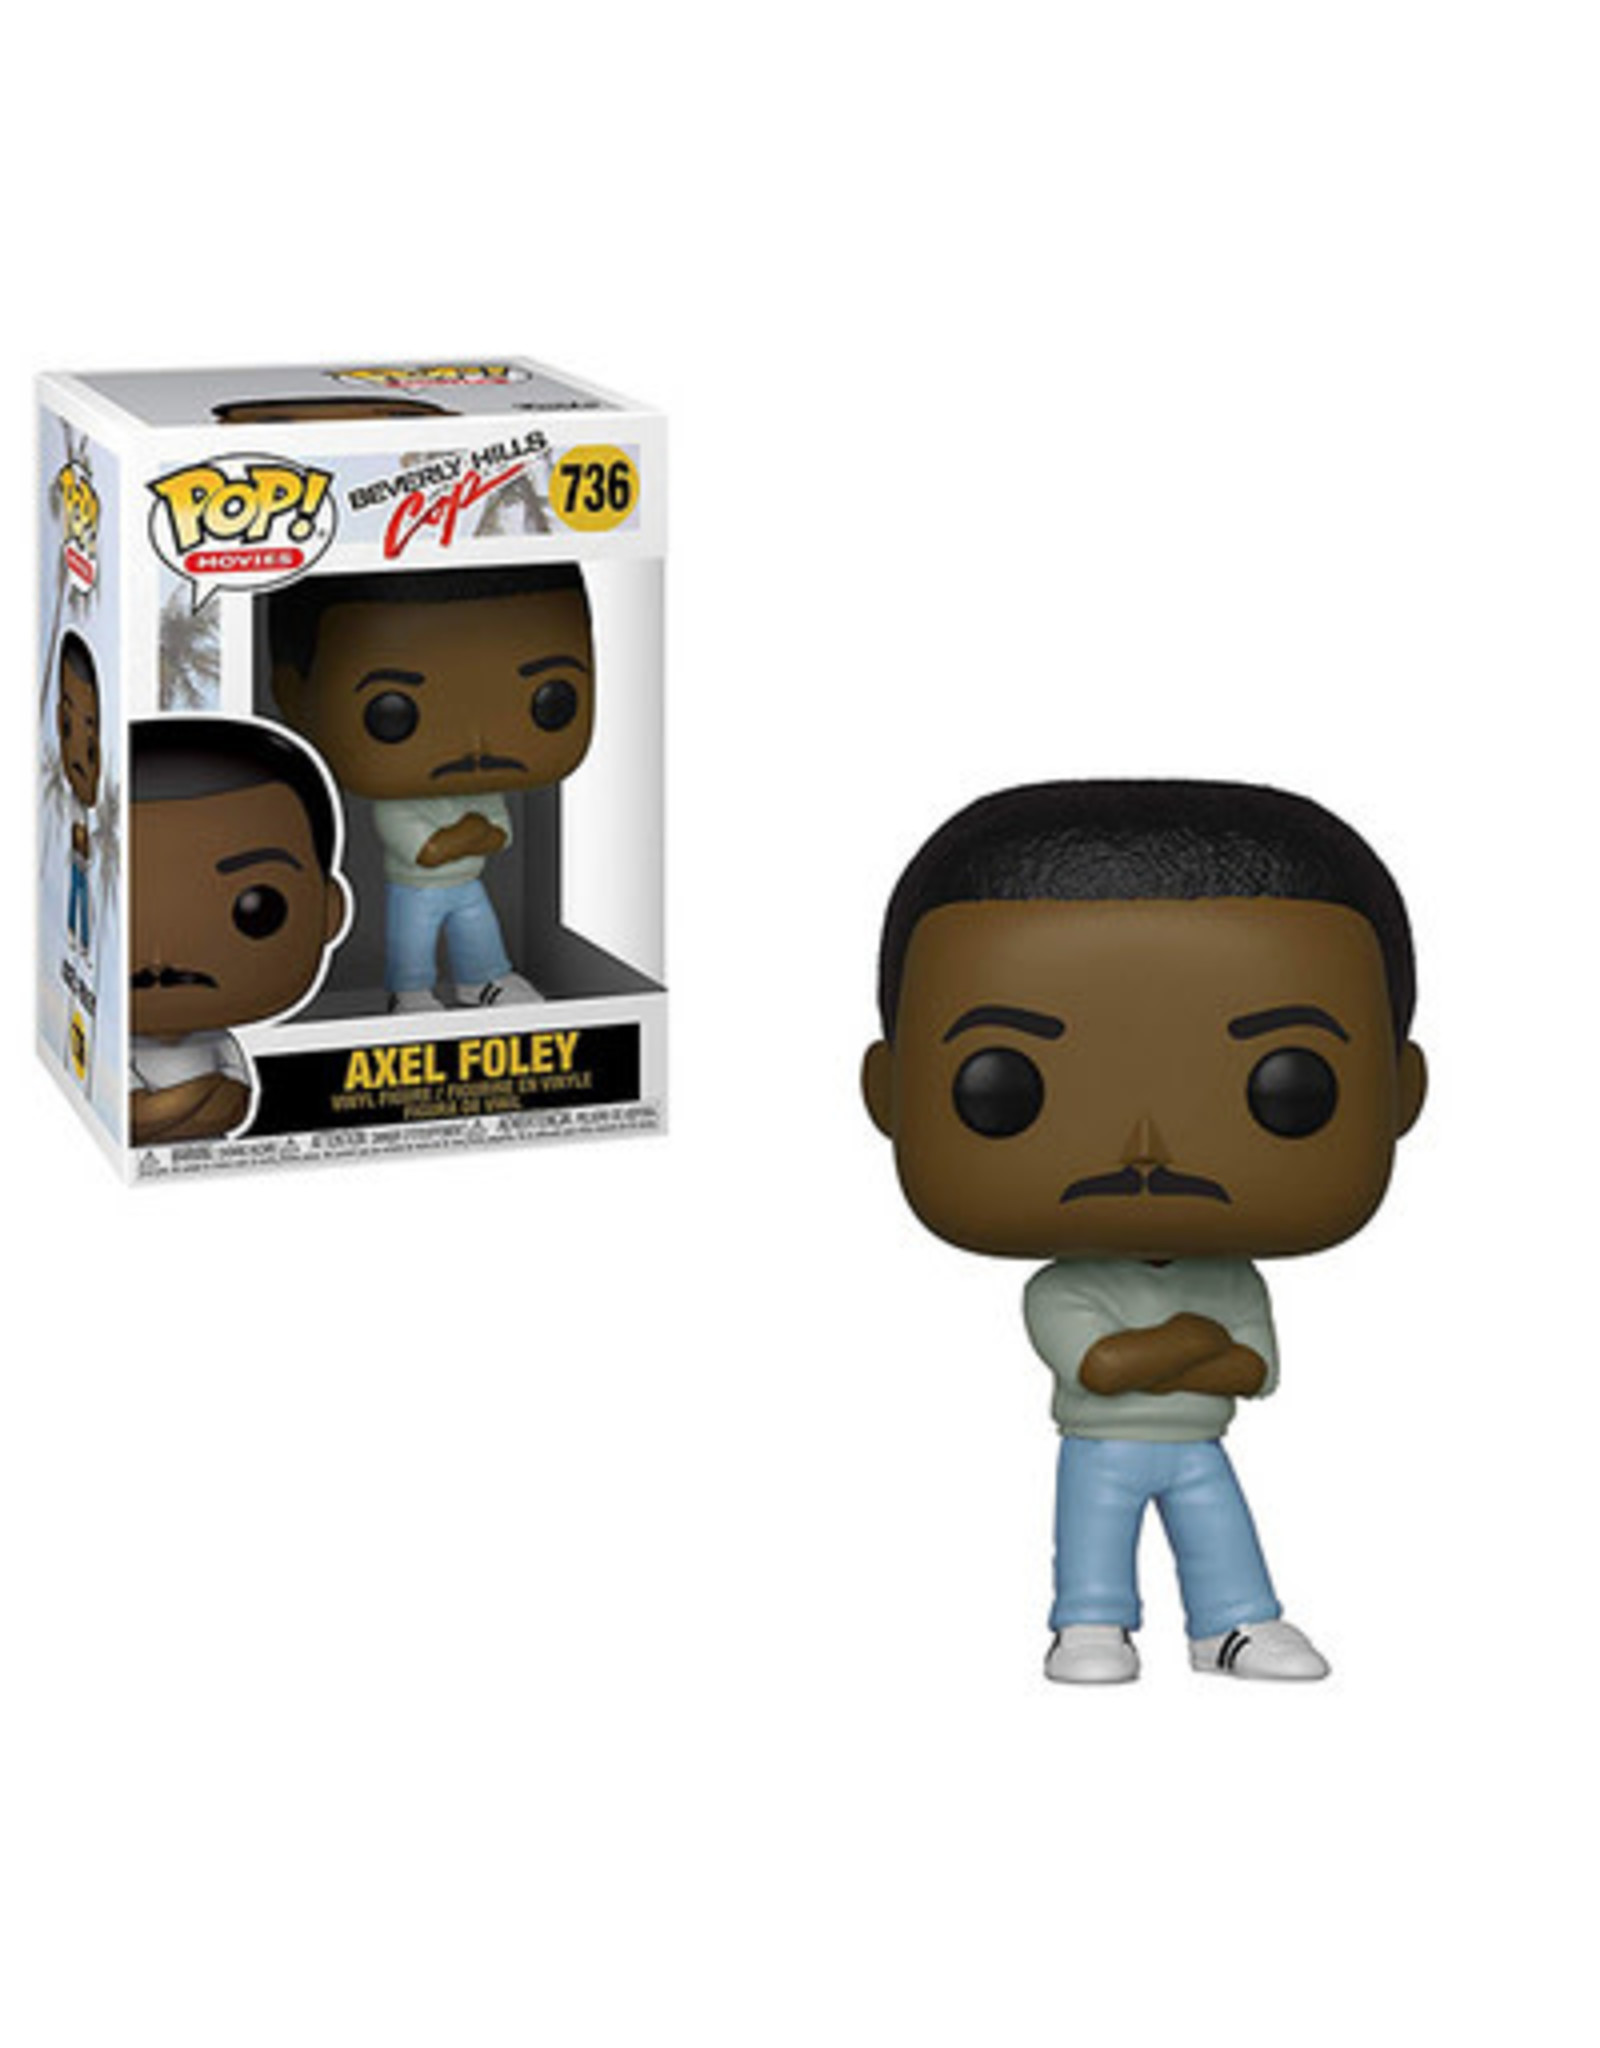 Funko BERVERLY HILLS COP POP! N° 736 - Axel